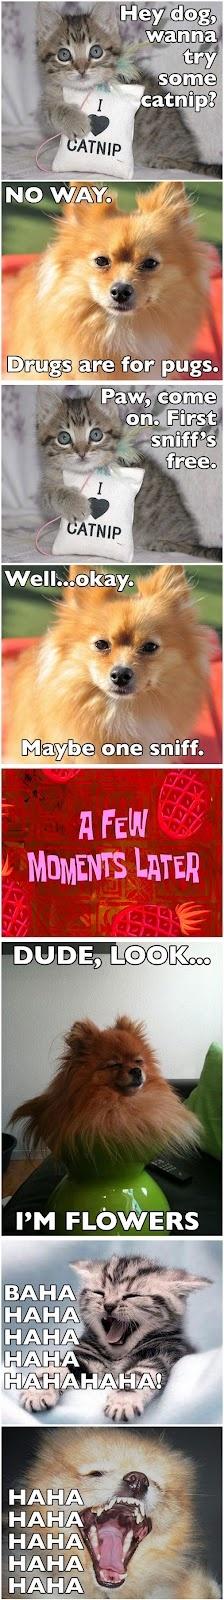 Dog Tries Catnip Funny Meme